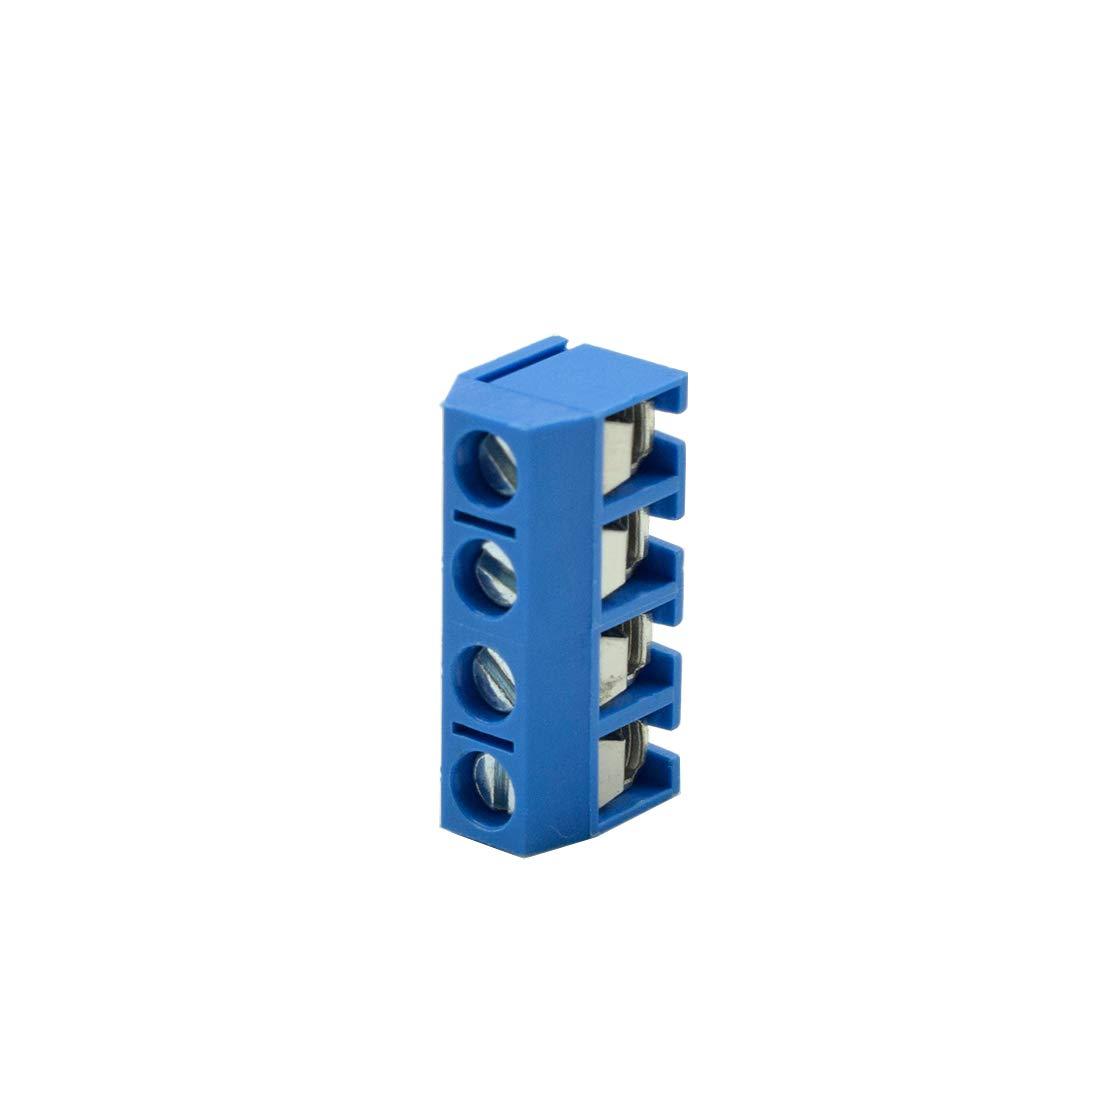 TUOREN 4Pin 5.08mm PCB Mount Screw Terminal Block Connector,Blue 300V 16A 10pcs